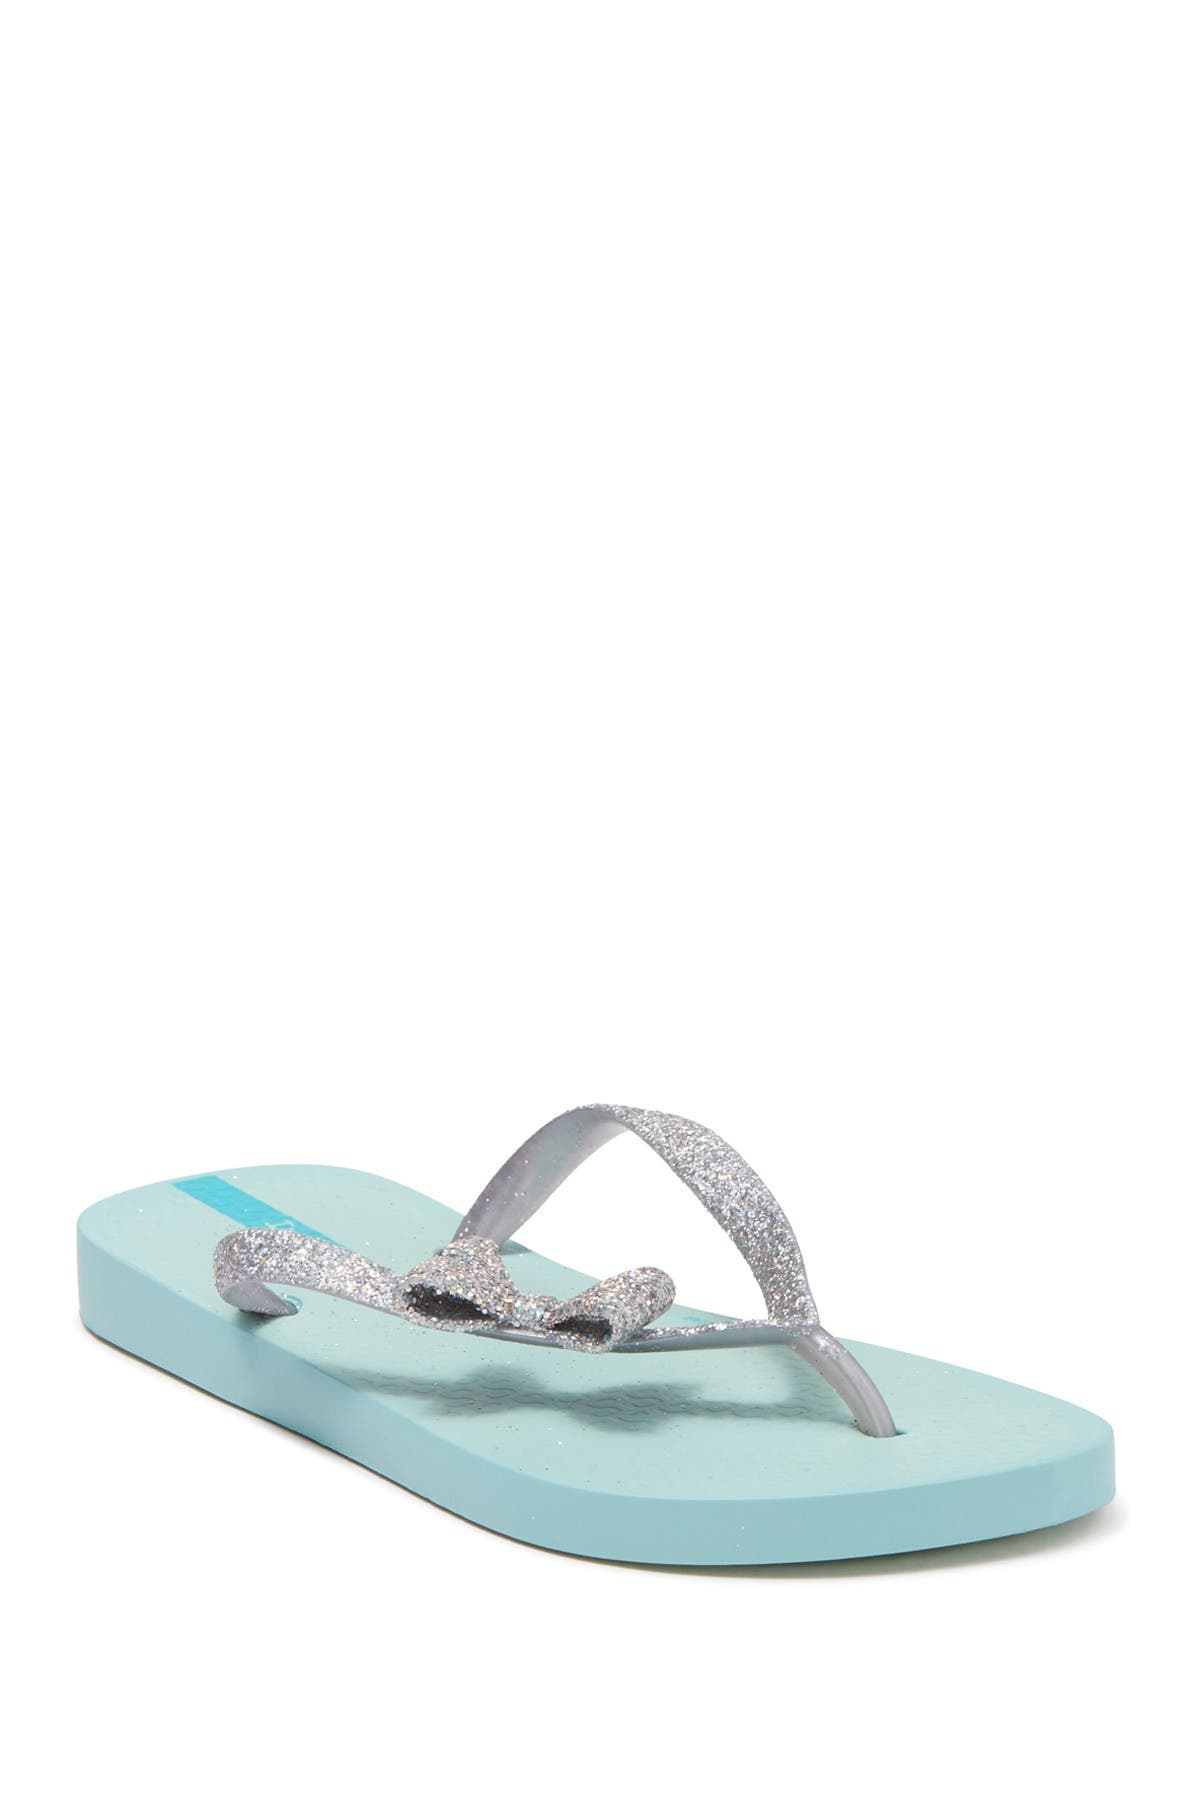 Image of Ipanema Glitter IV Flip Flop